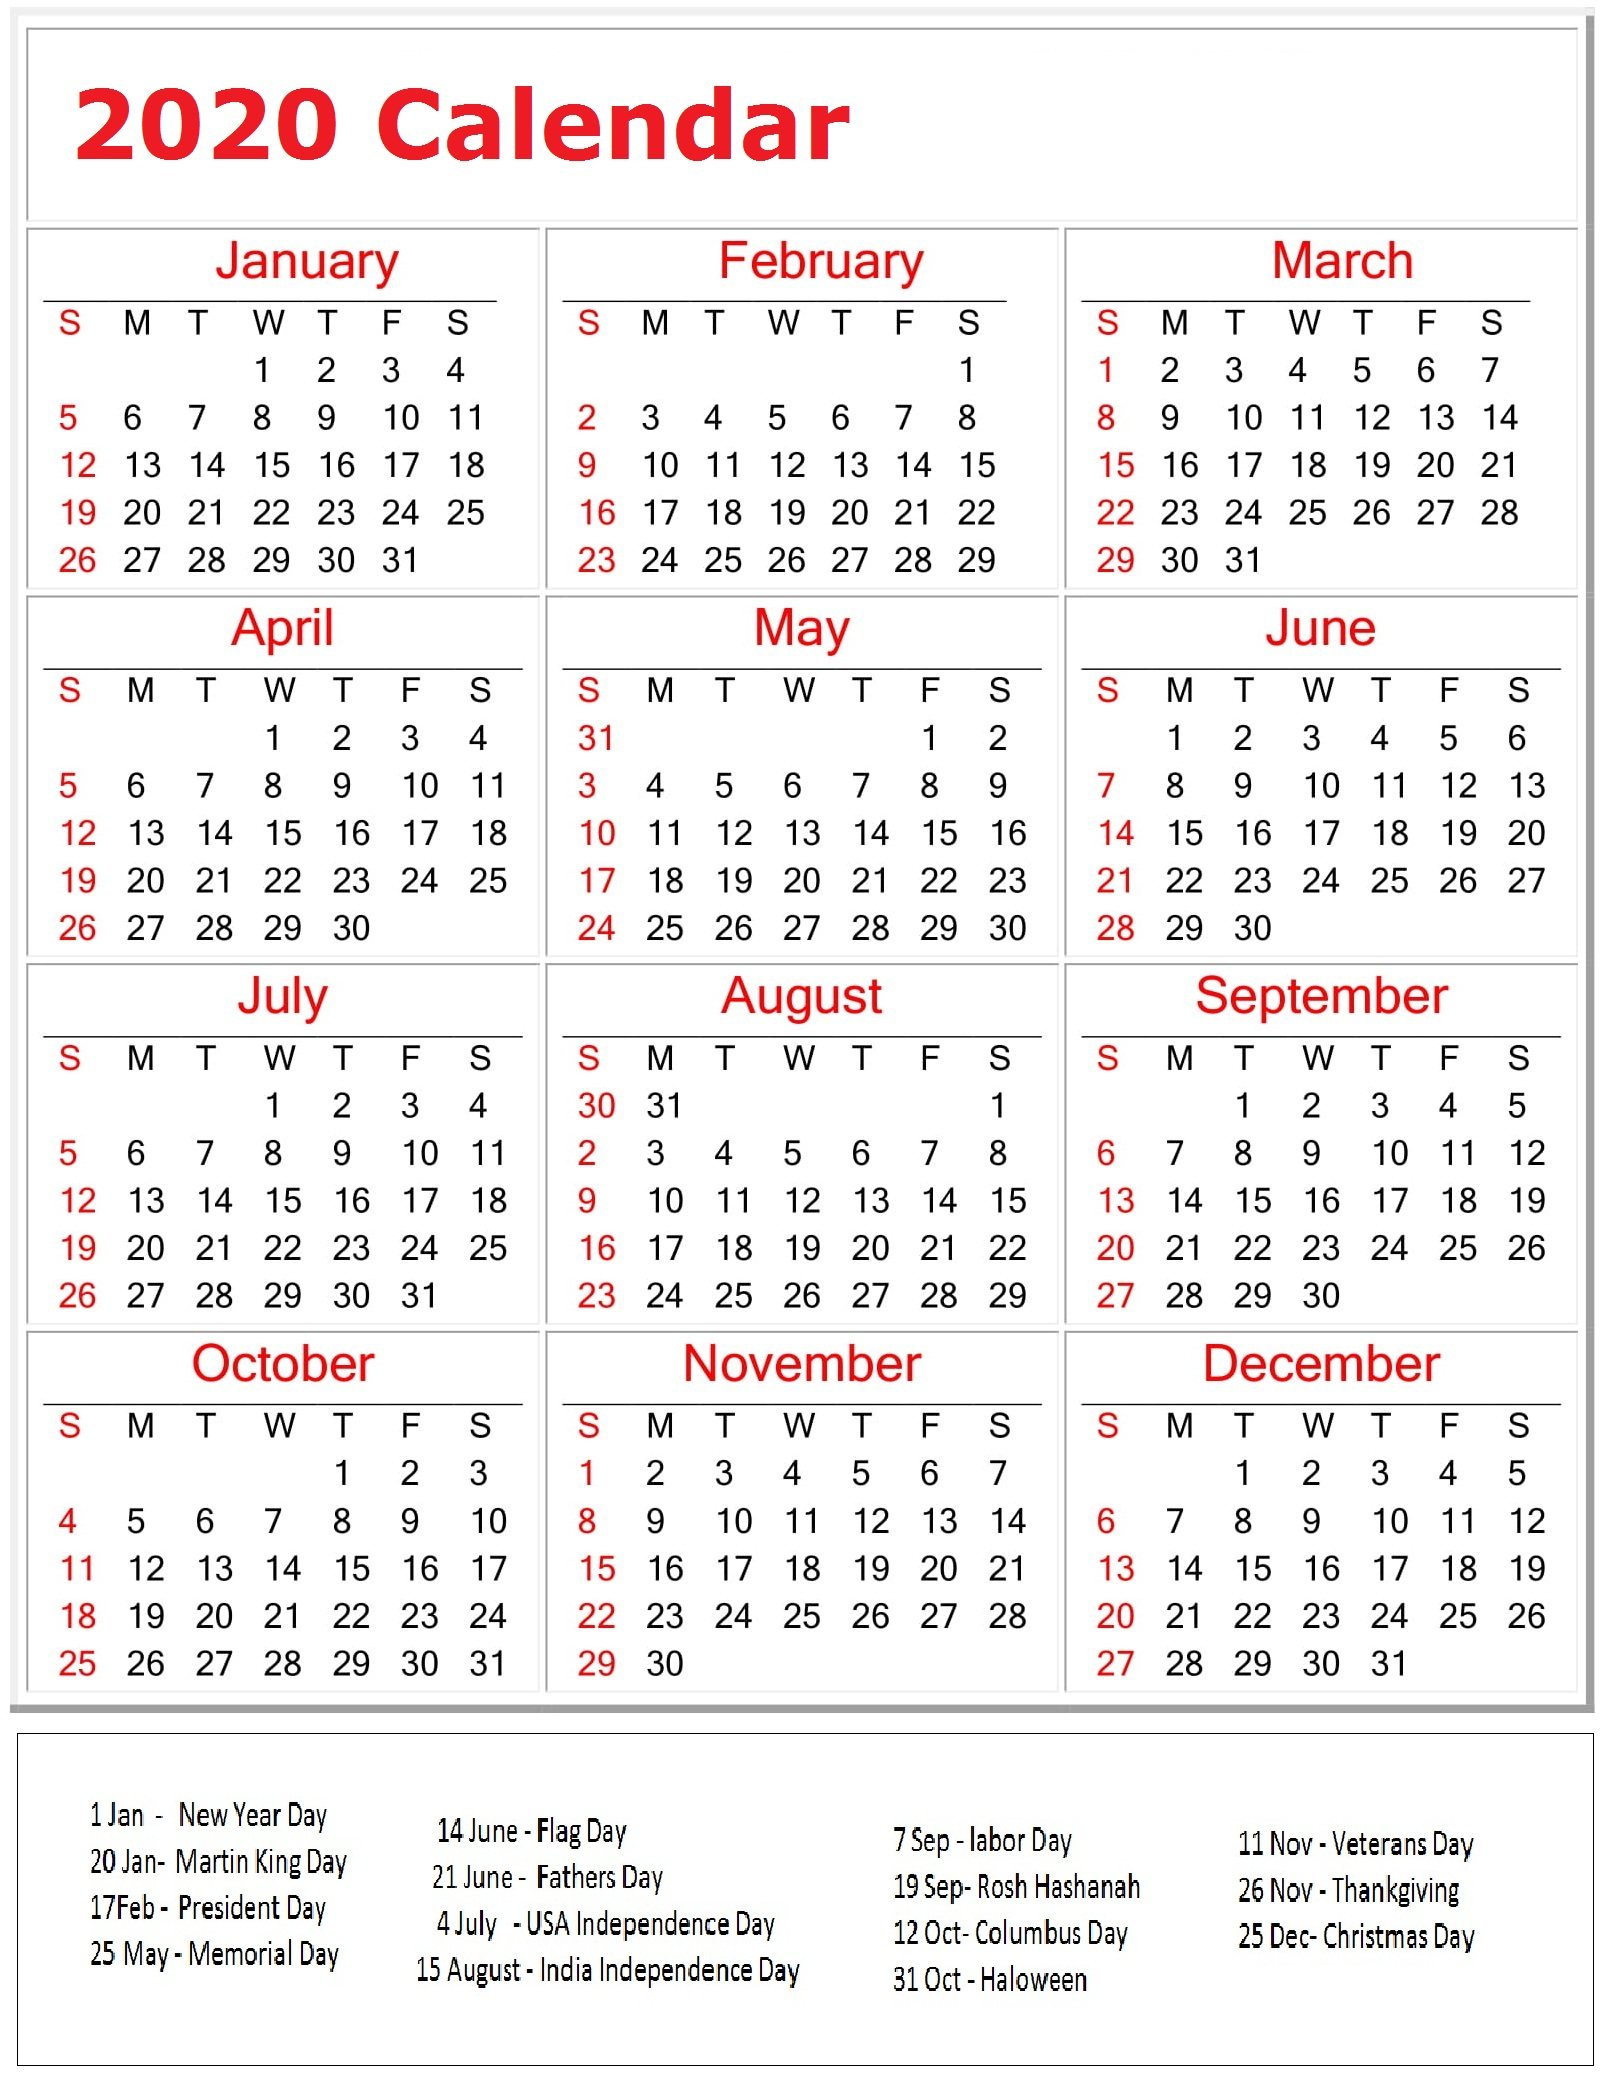 Calendar 2020  Google Search pertaining to Blogilates December 2020 Calendar